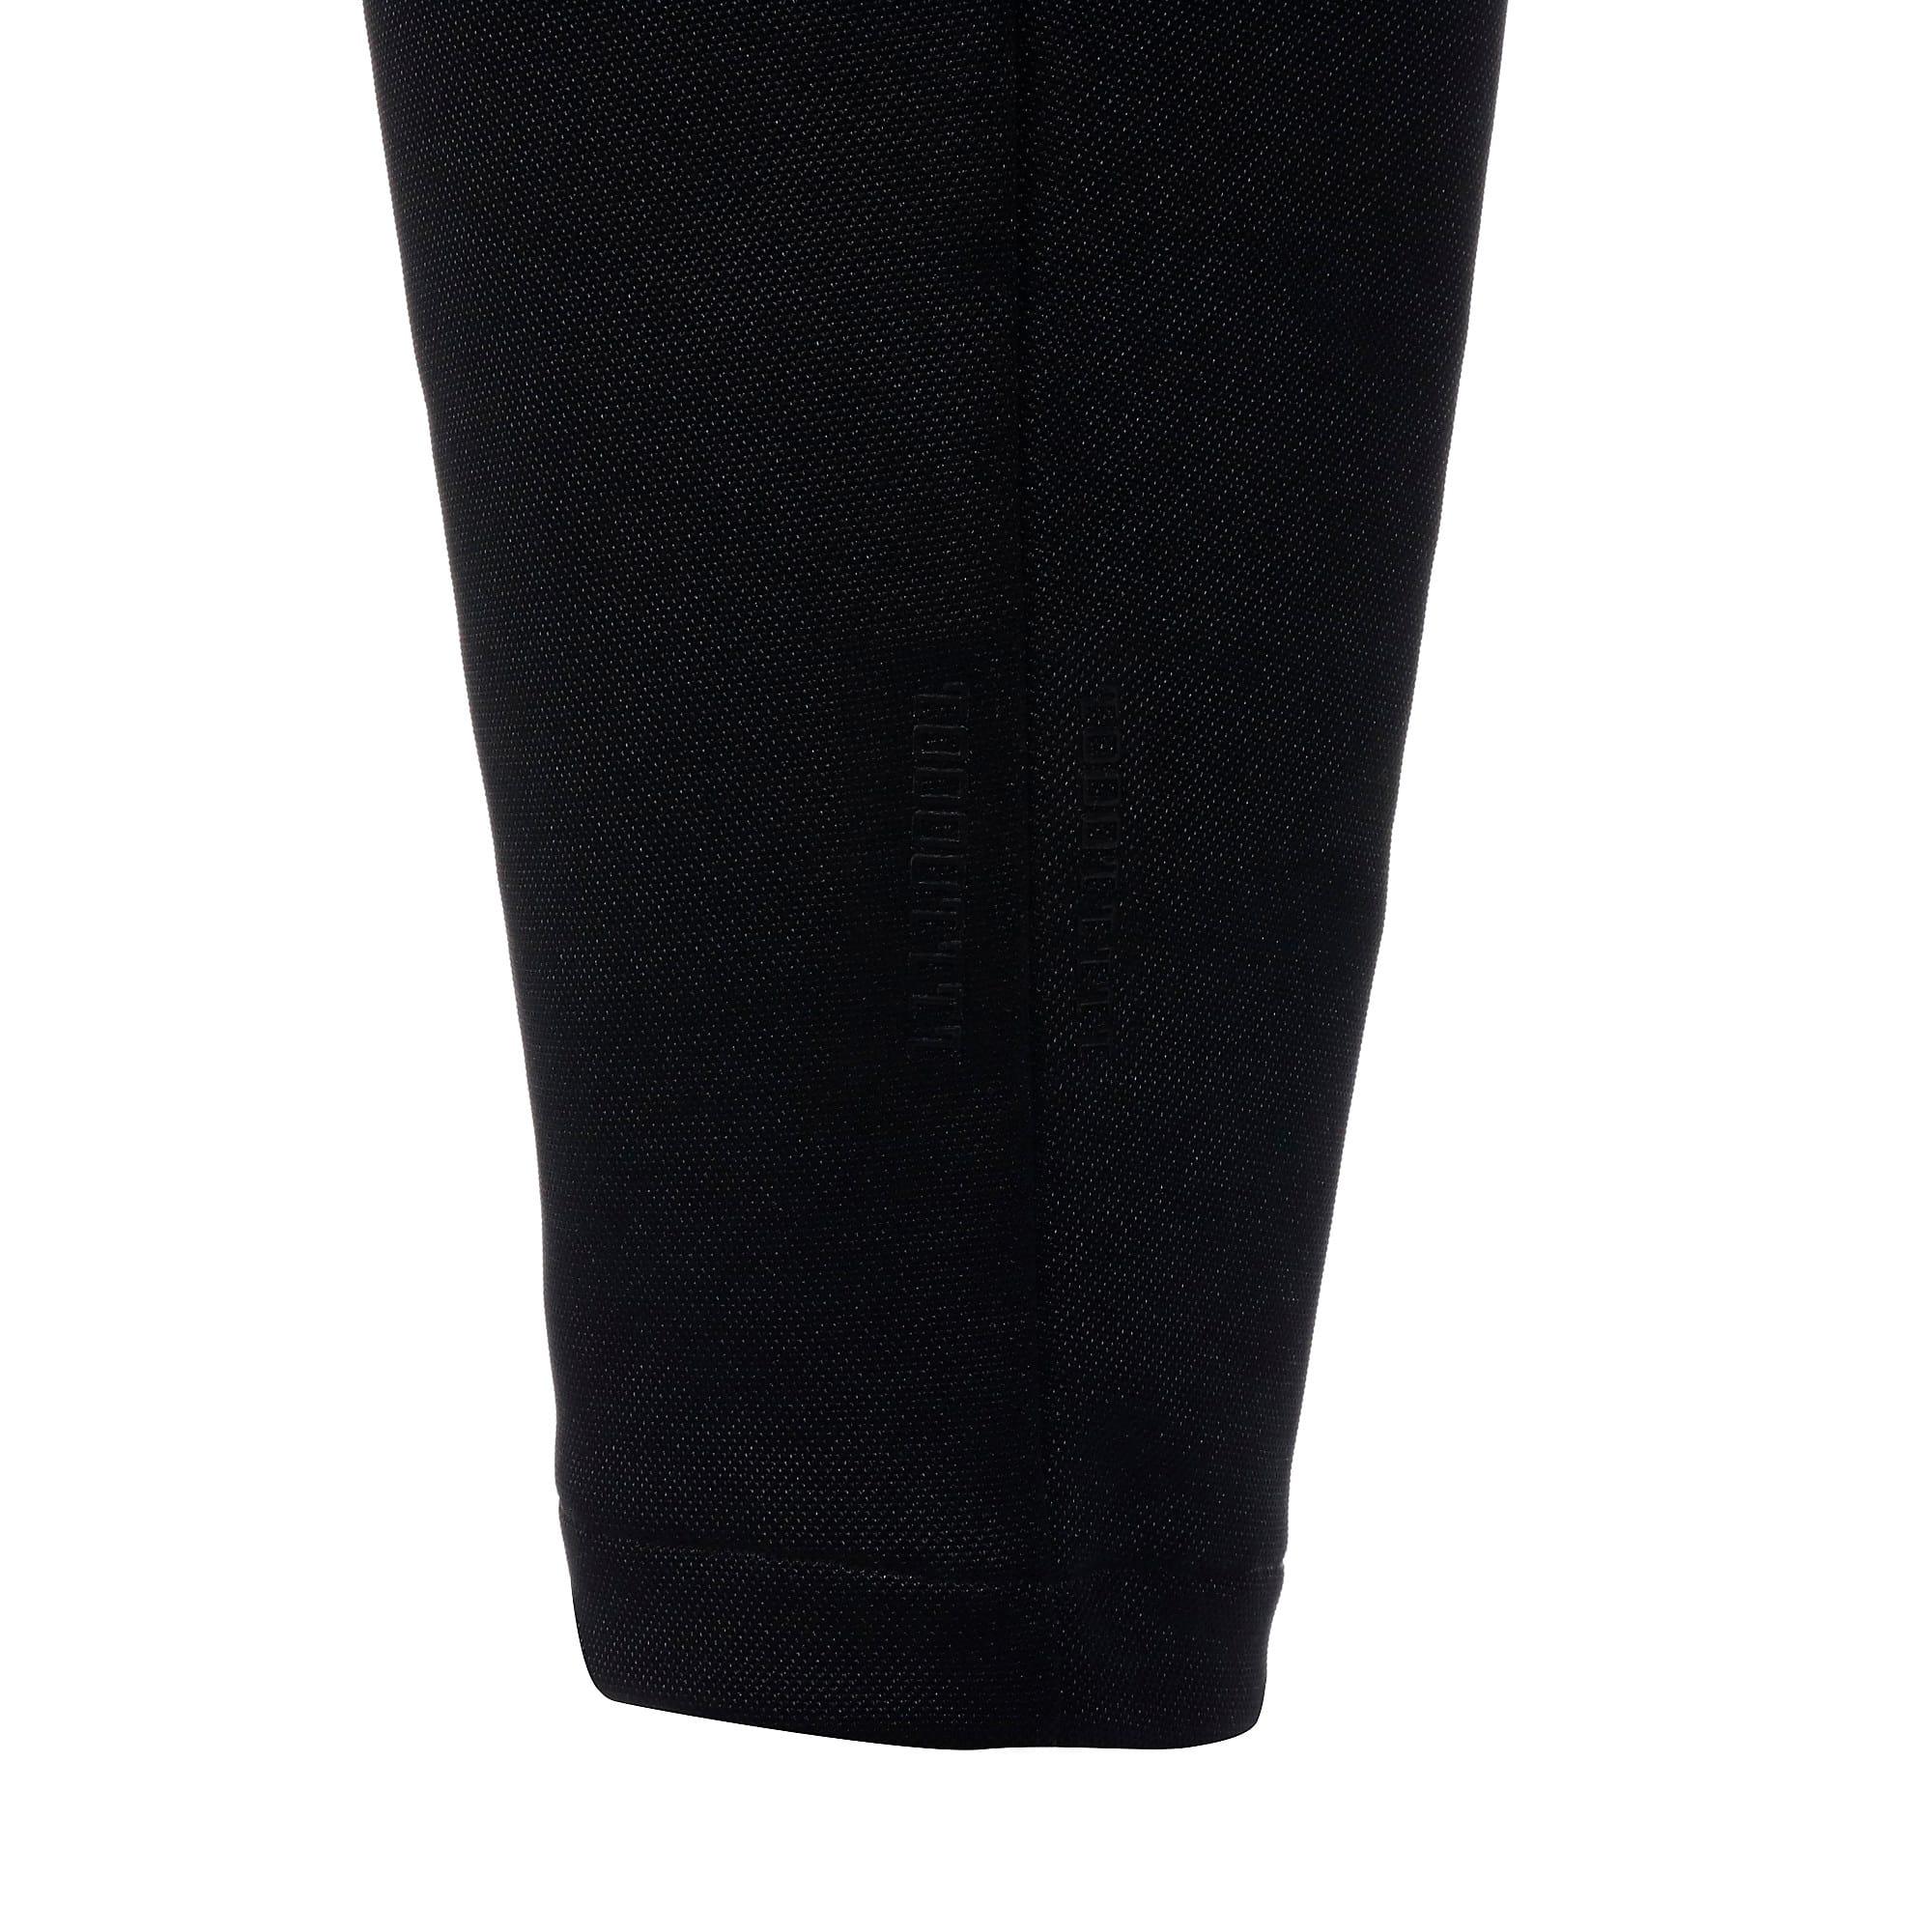 Thumbnail 4 of RS-0 CAPSULE PANTS, Puma Black, medium-JPN